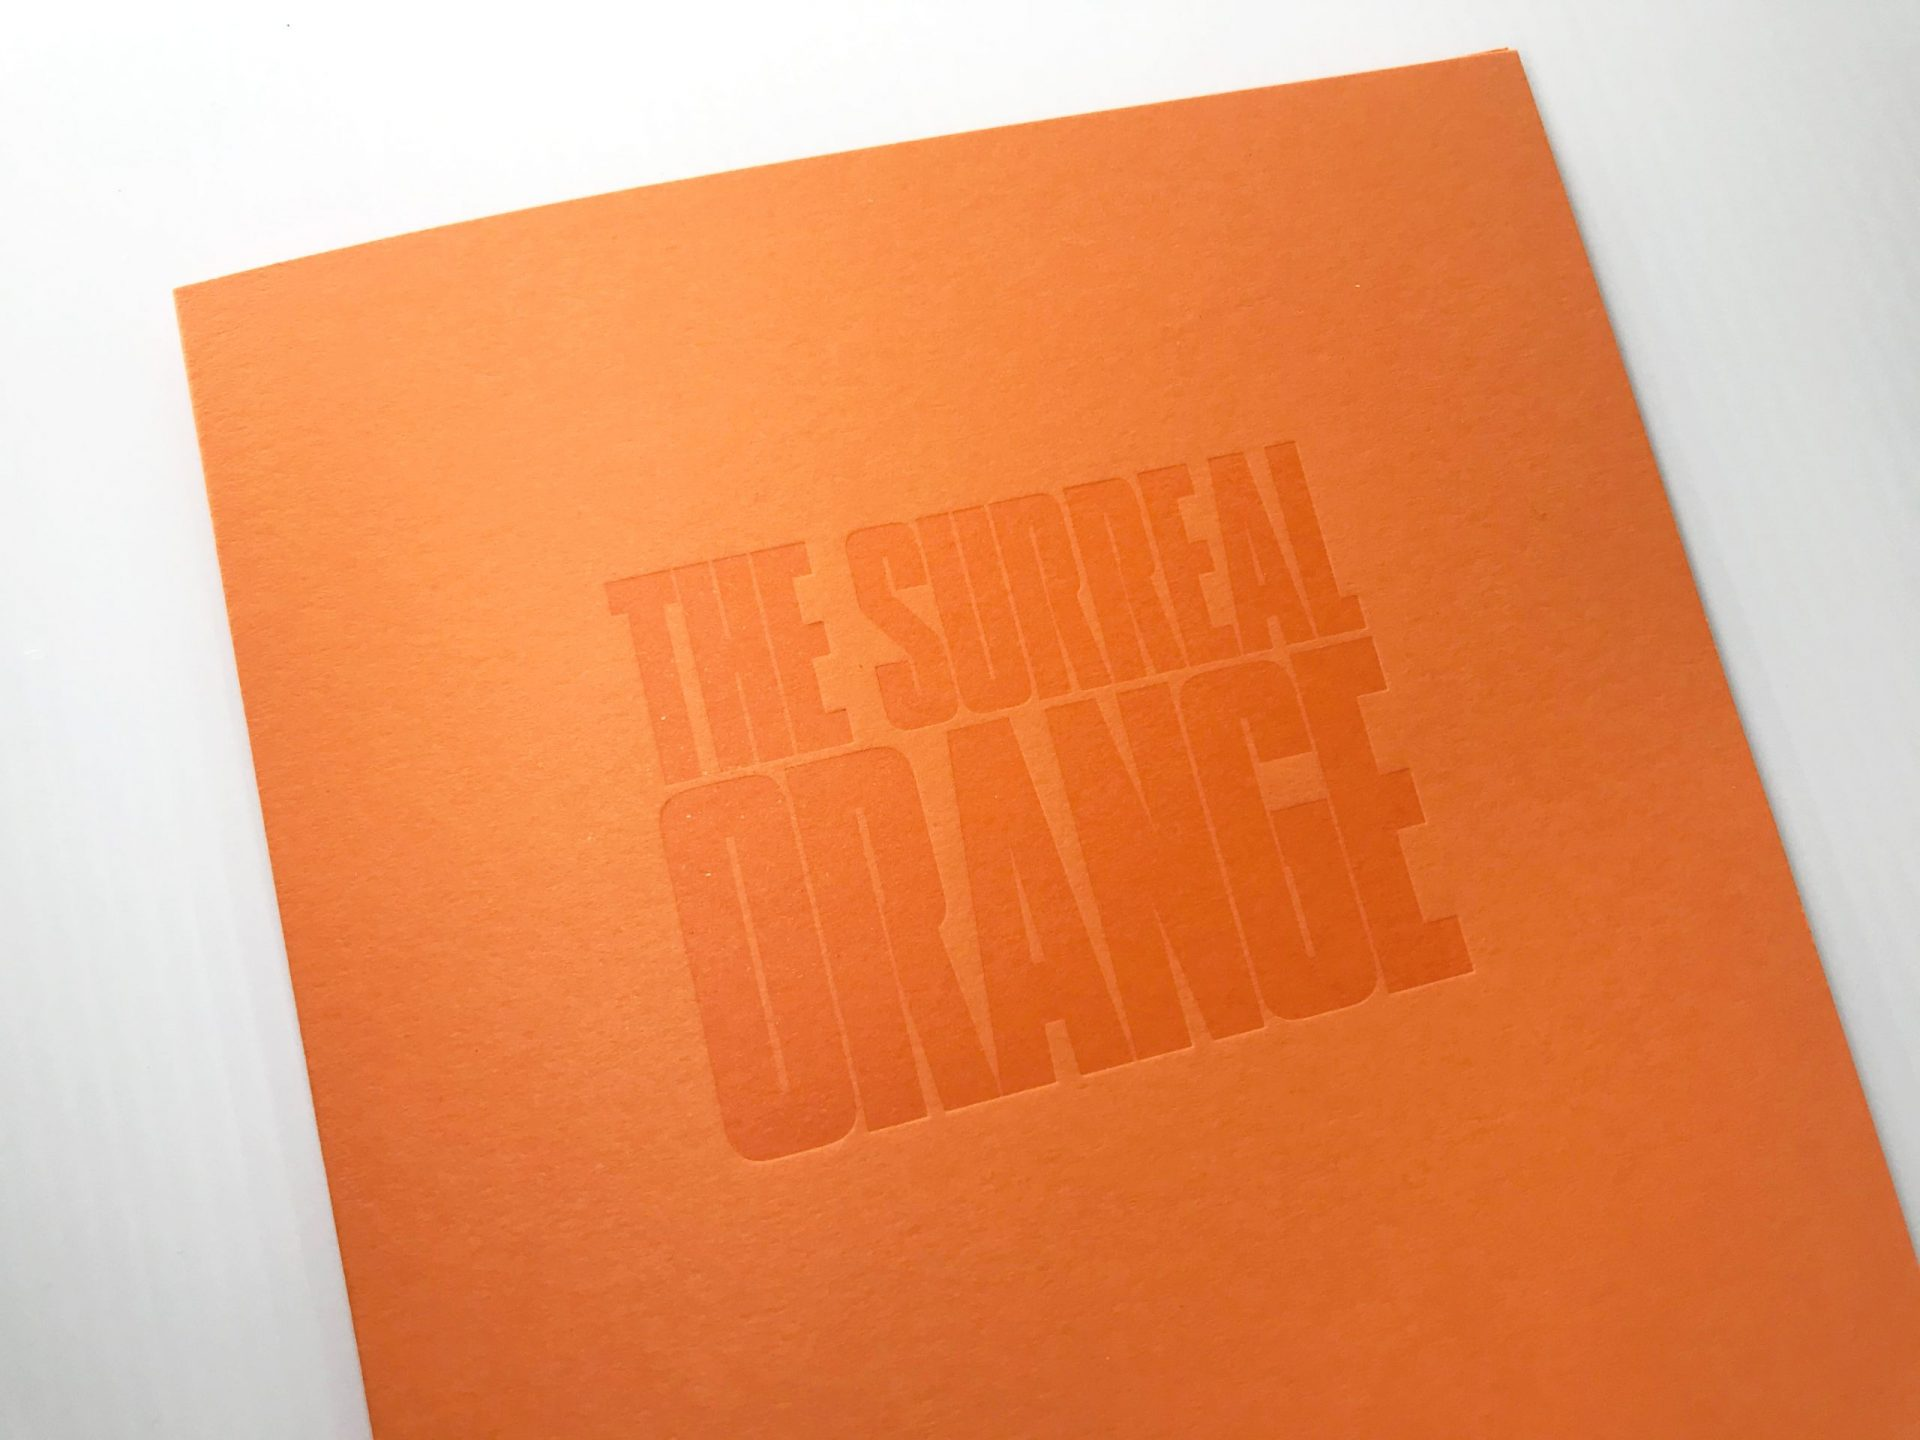 detail jim riswold the surreal orange stamp folio